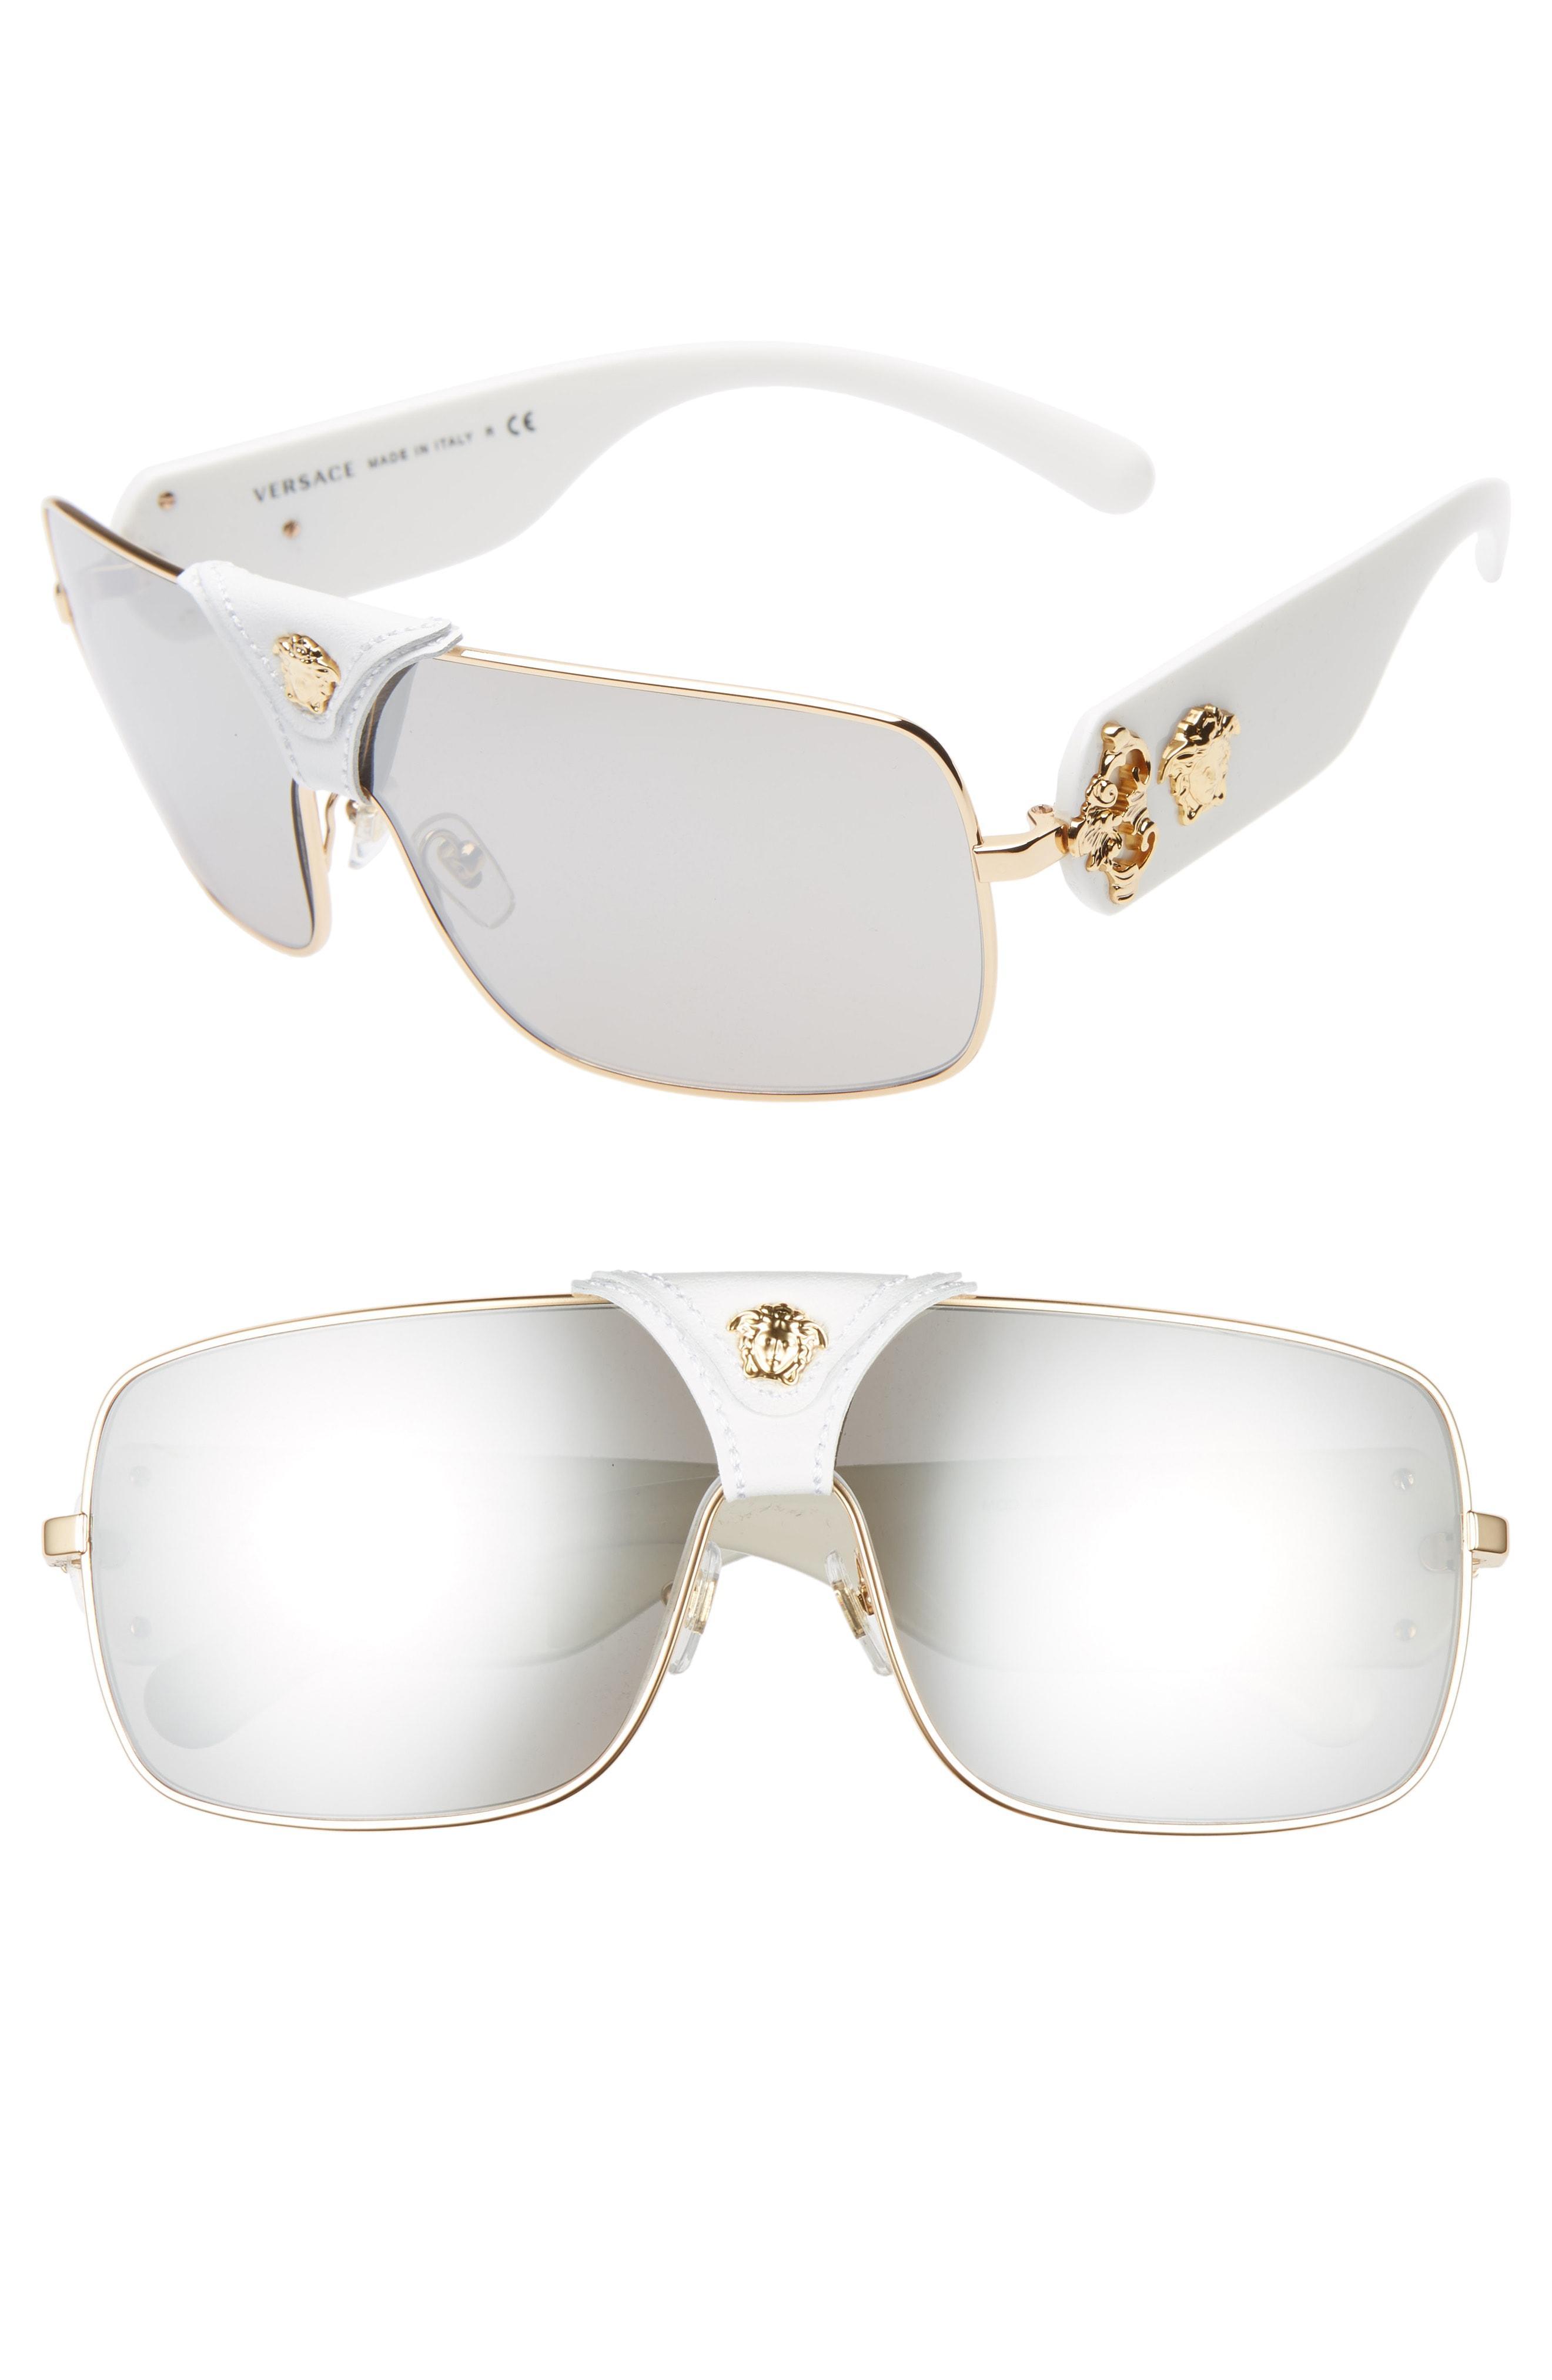 c80bfe295e27 Lyst - Versace 145mm Mirrored Shield Sunglasses in White